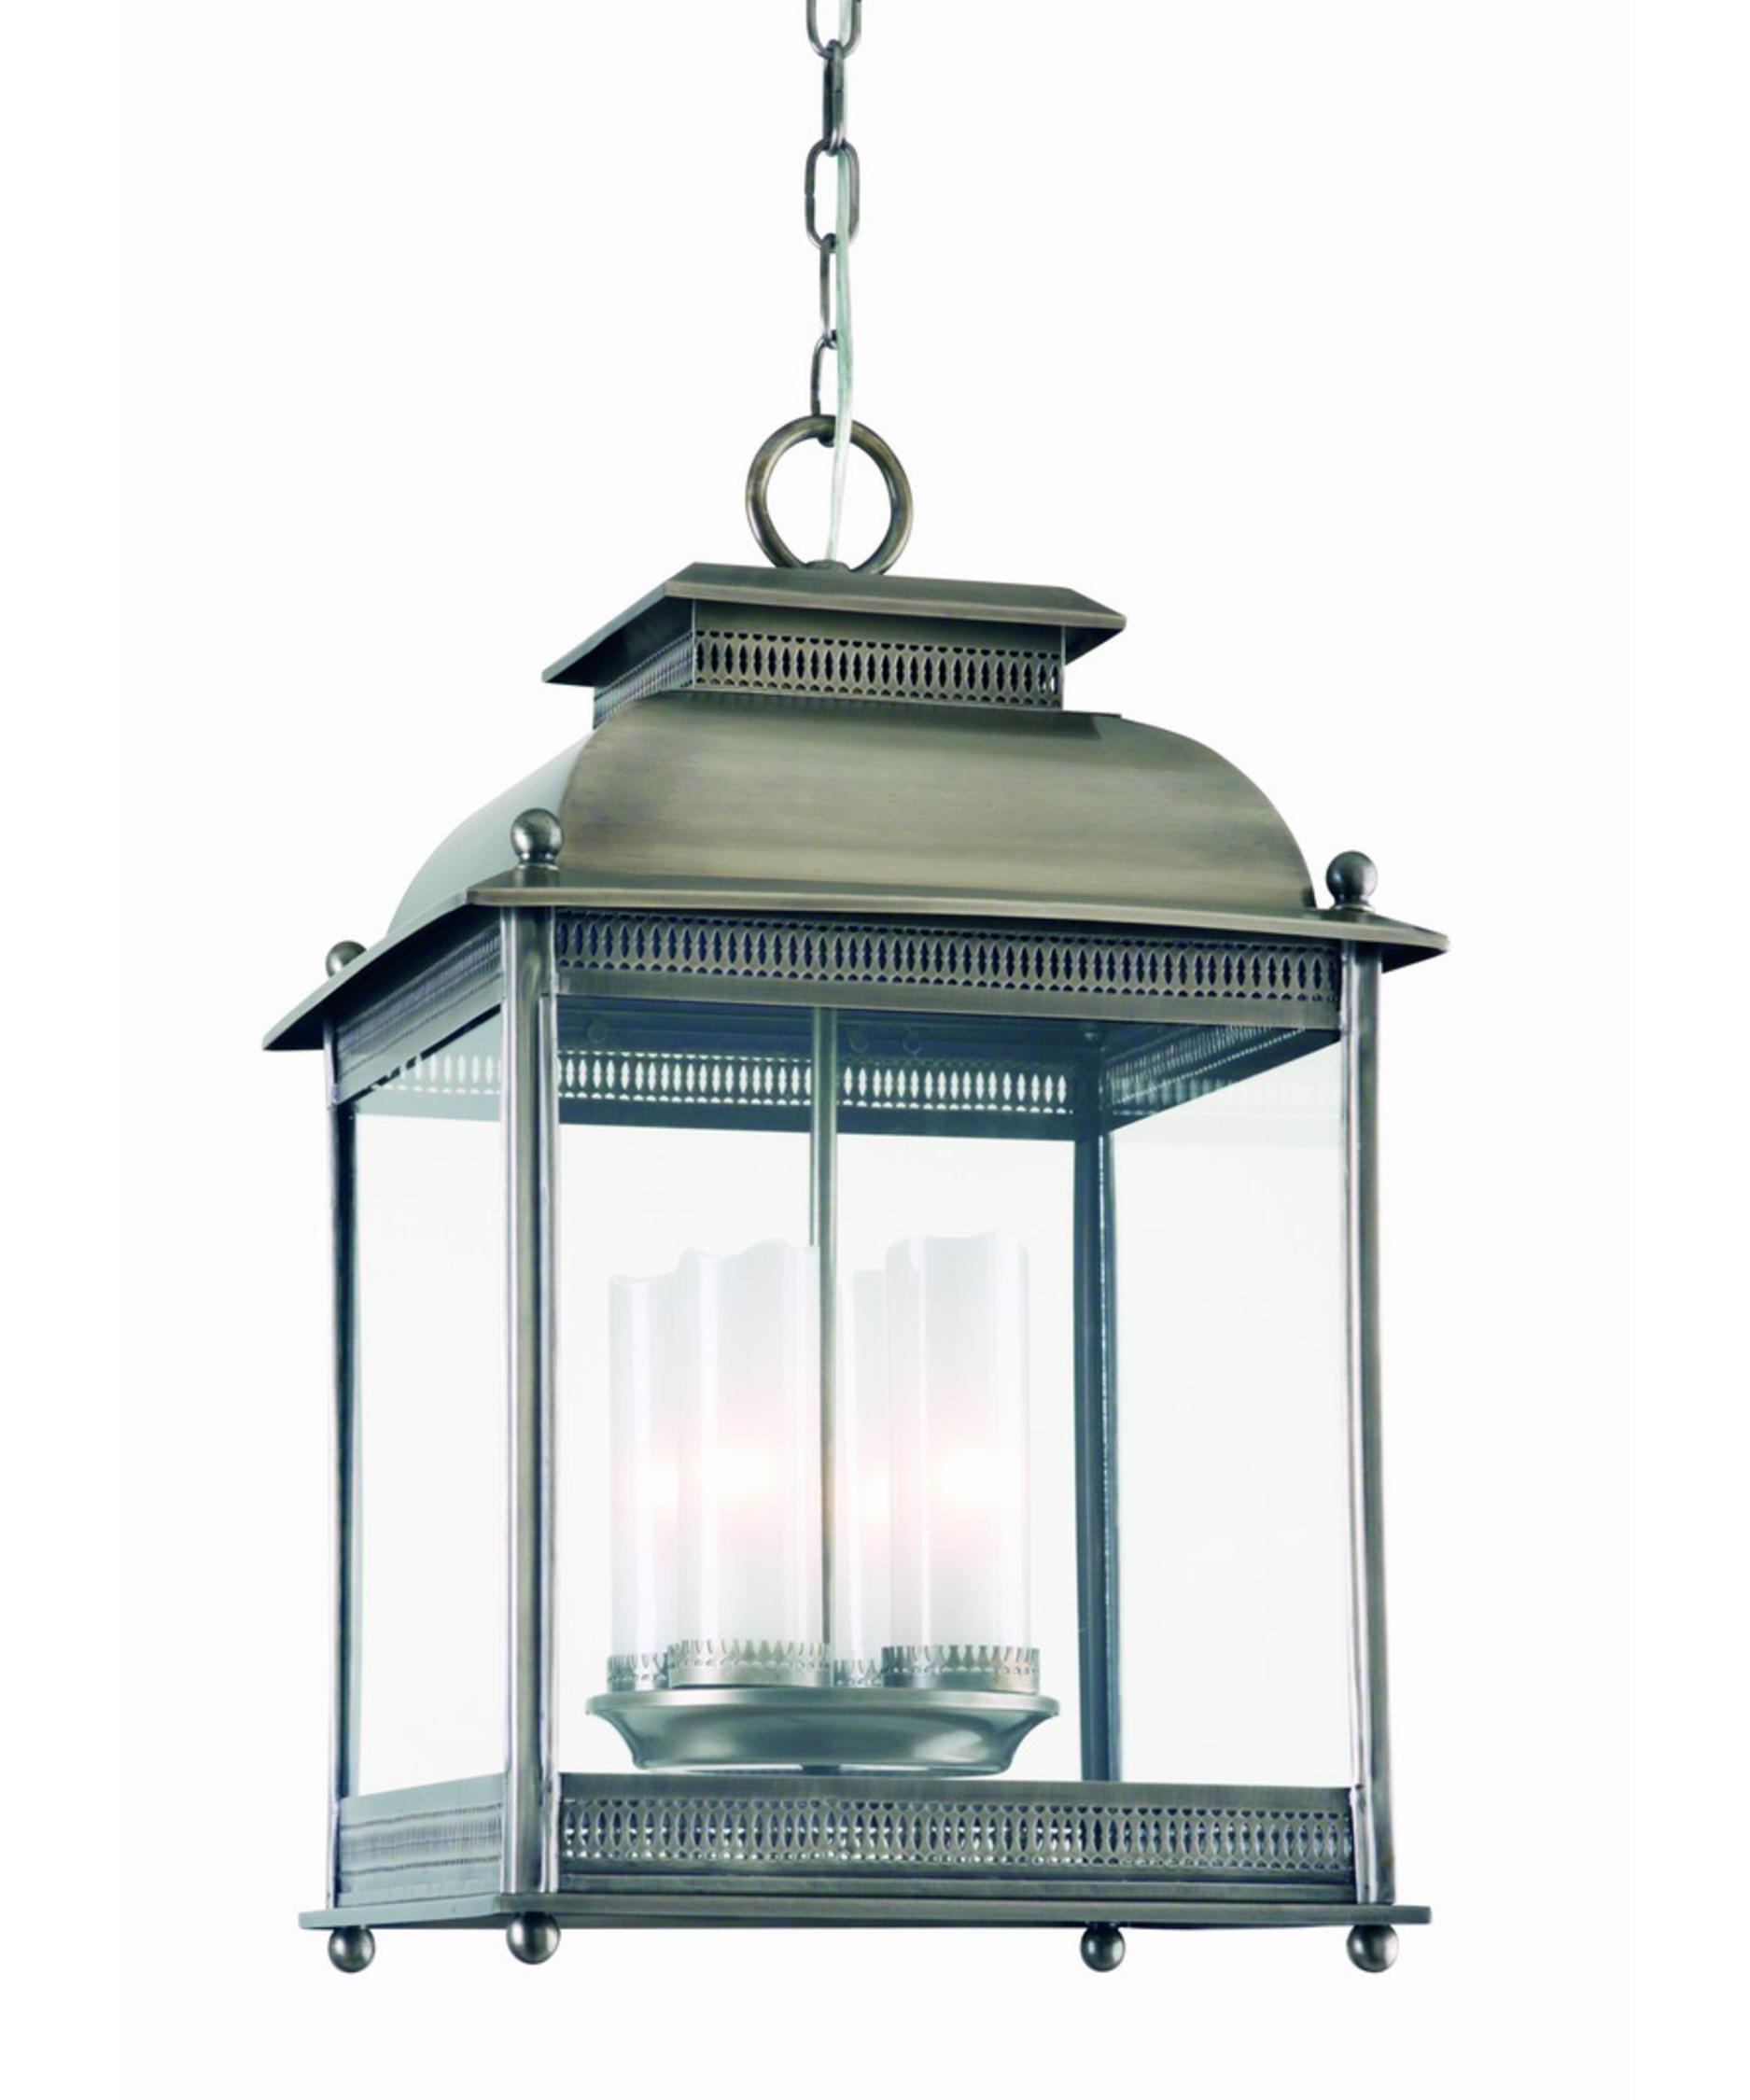 Outdoor hanging lighting - Troy Lighting F9716 Covent Garden 14 Inch Wide 4 Light Outdoor Hanging Lantern Capitol Lighting 1 800lighting Com